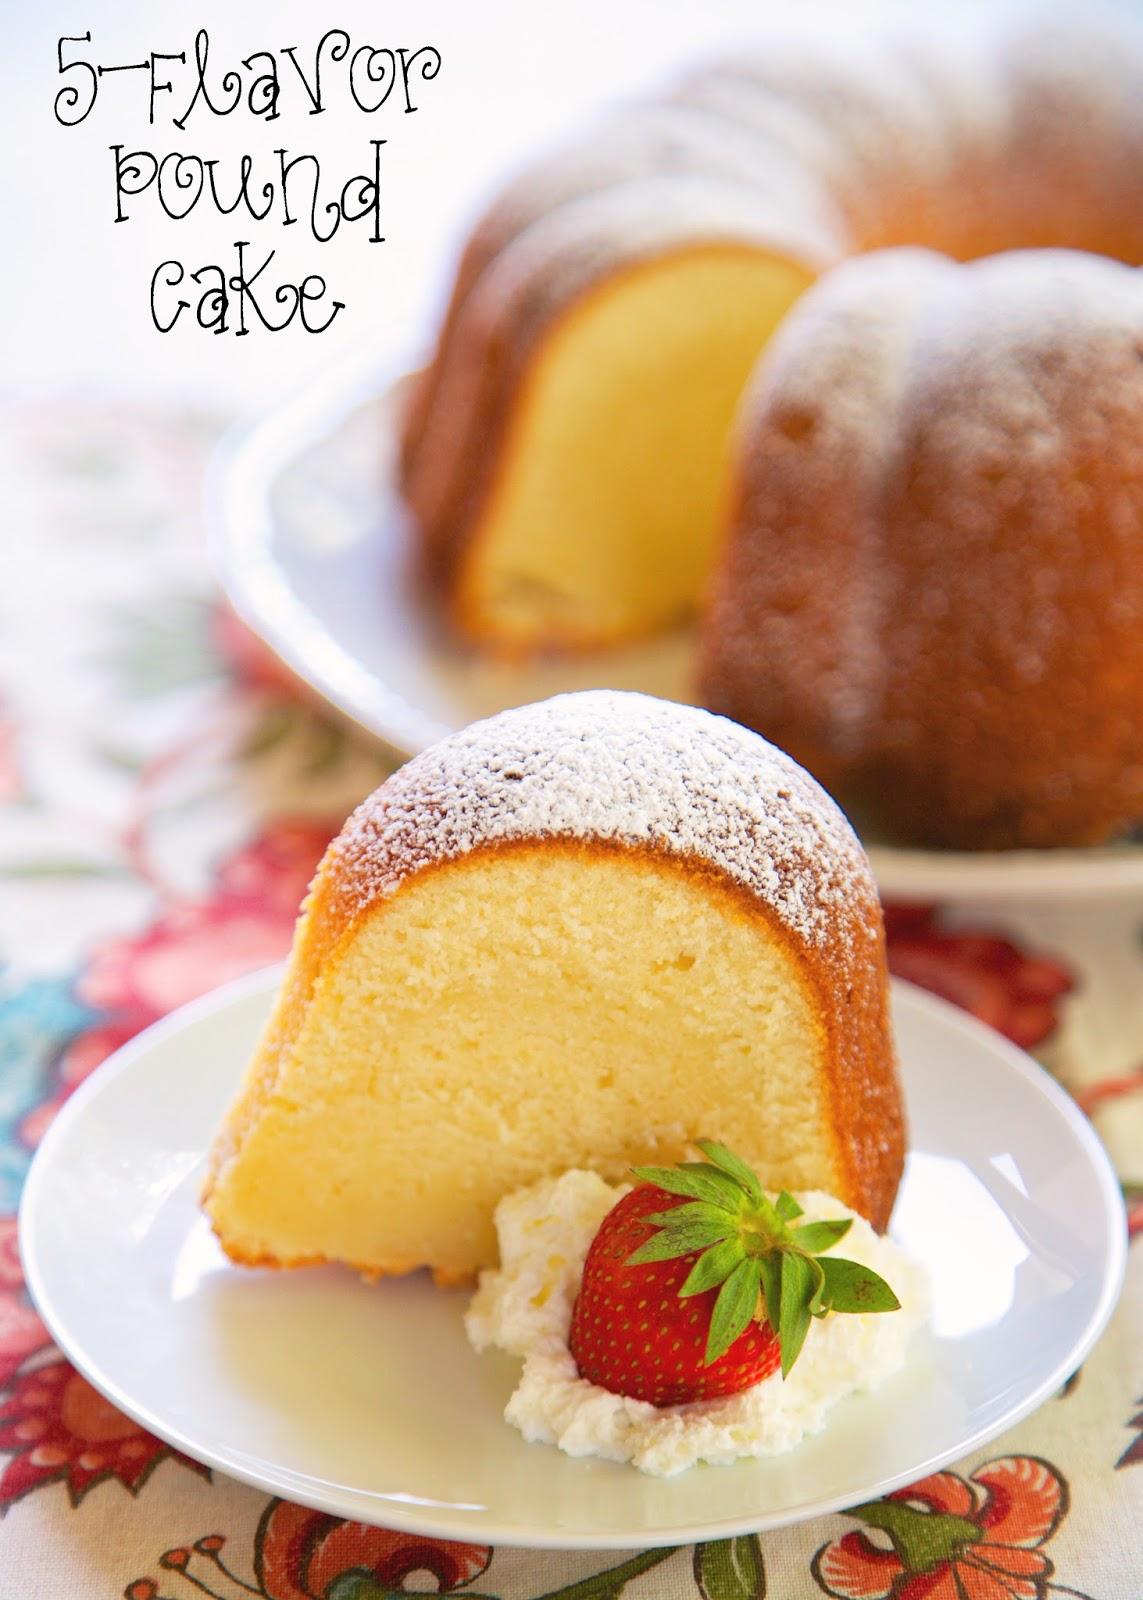 Watkins five flavor cake recipe